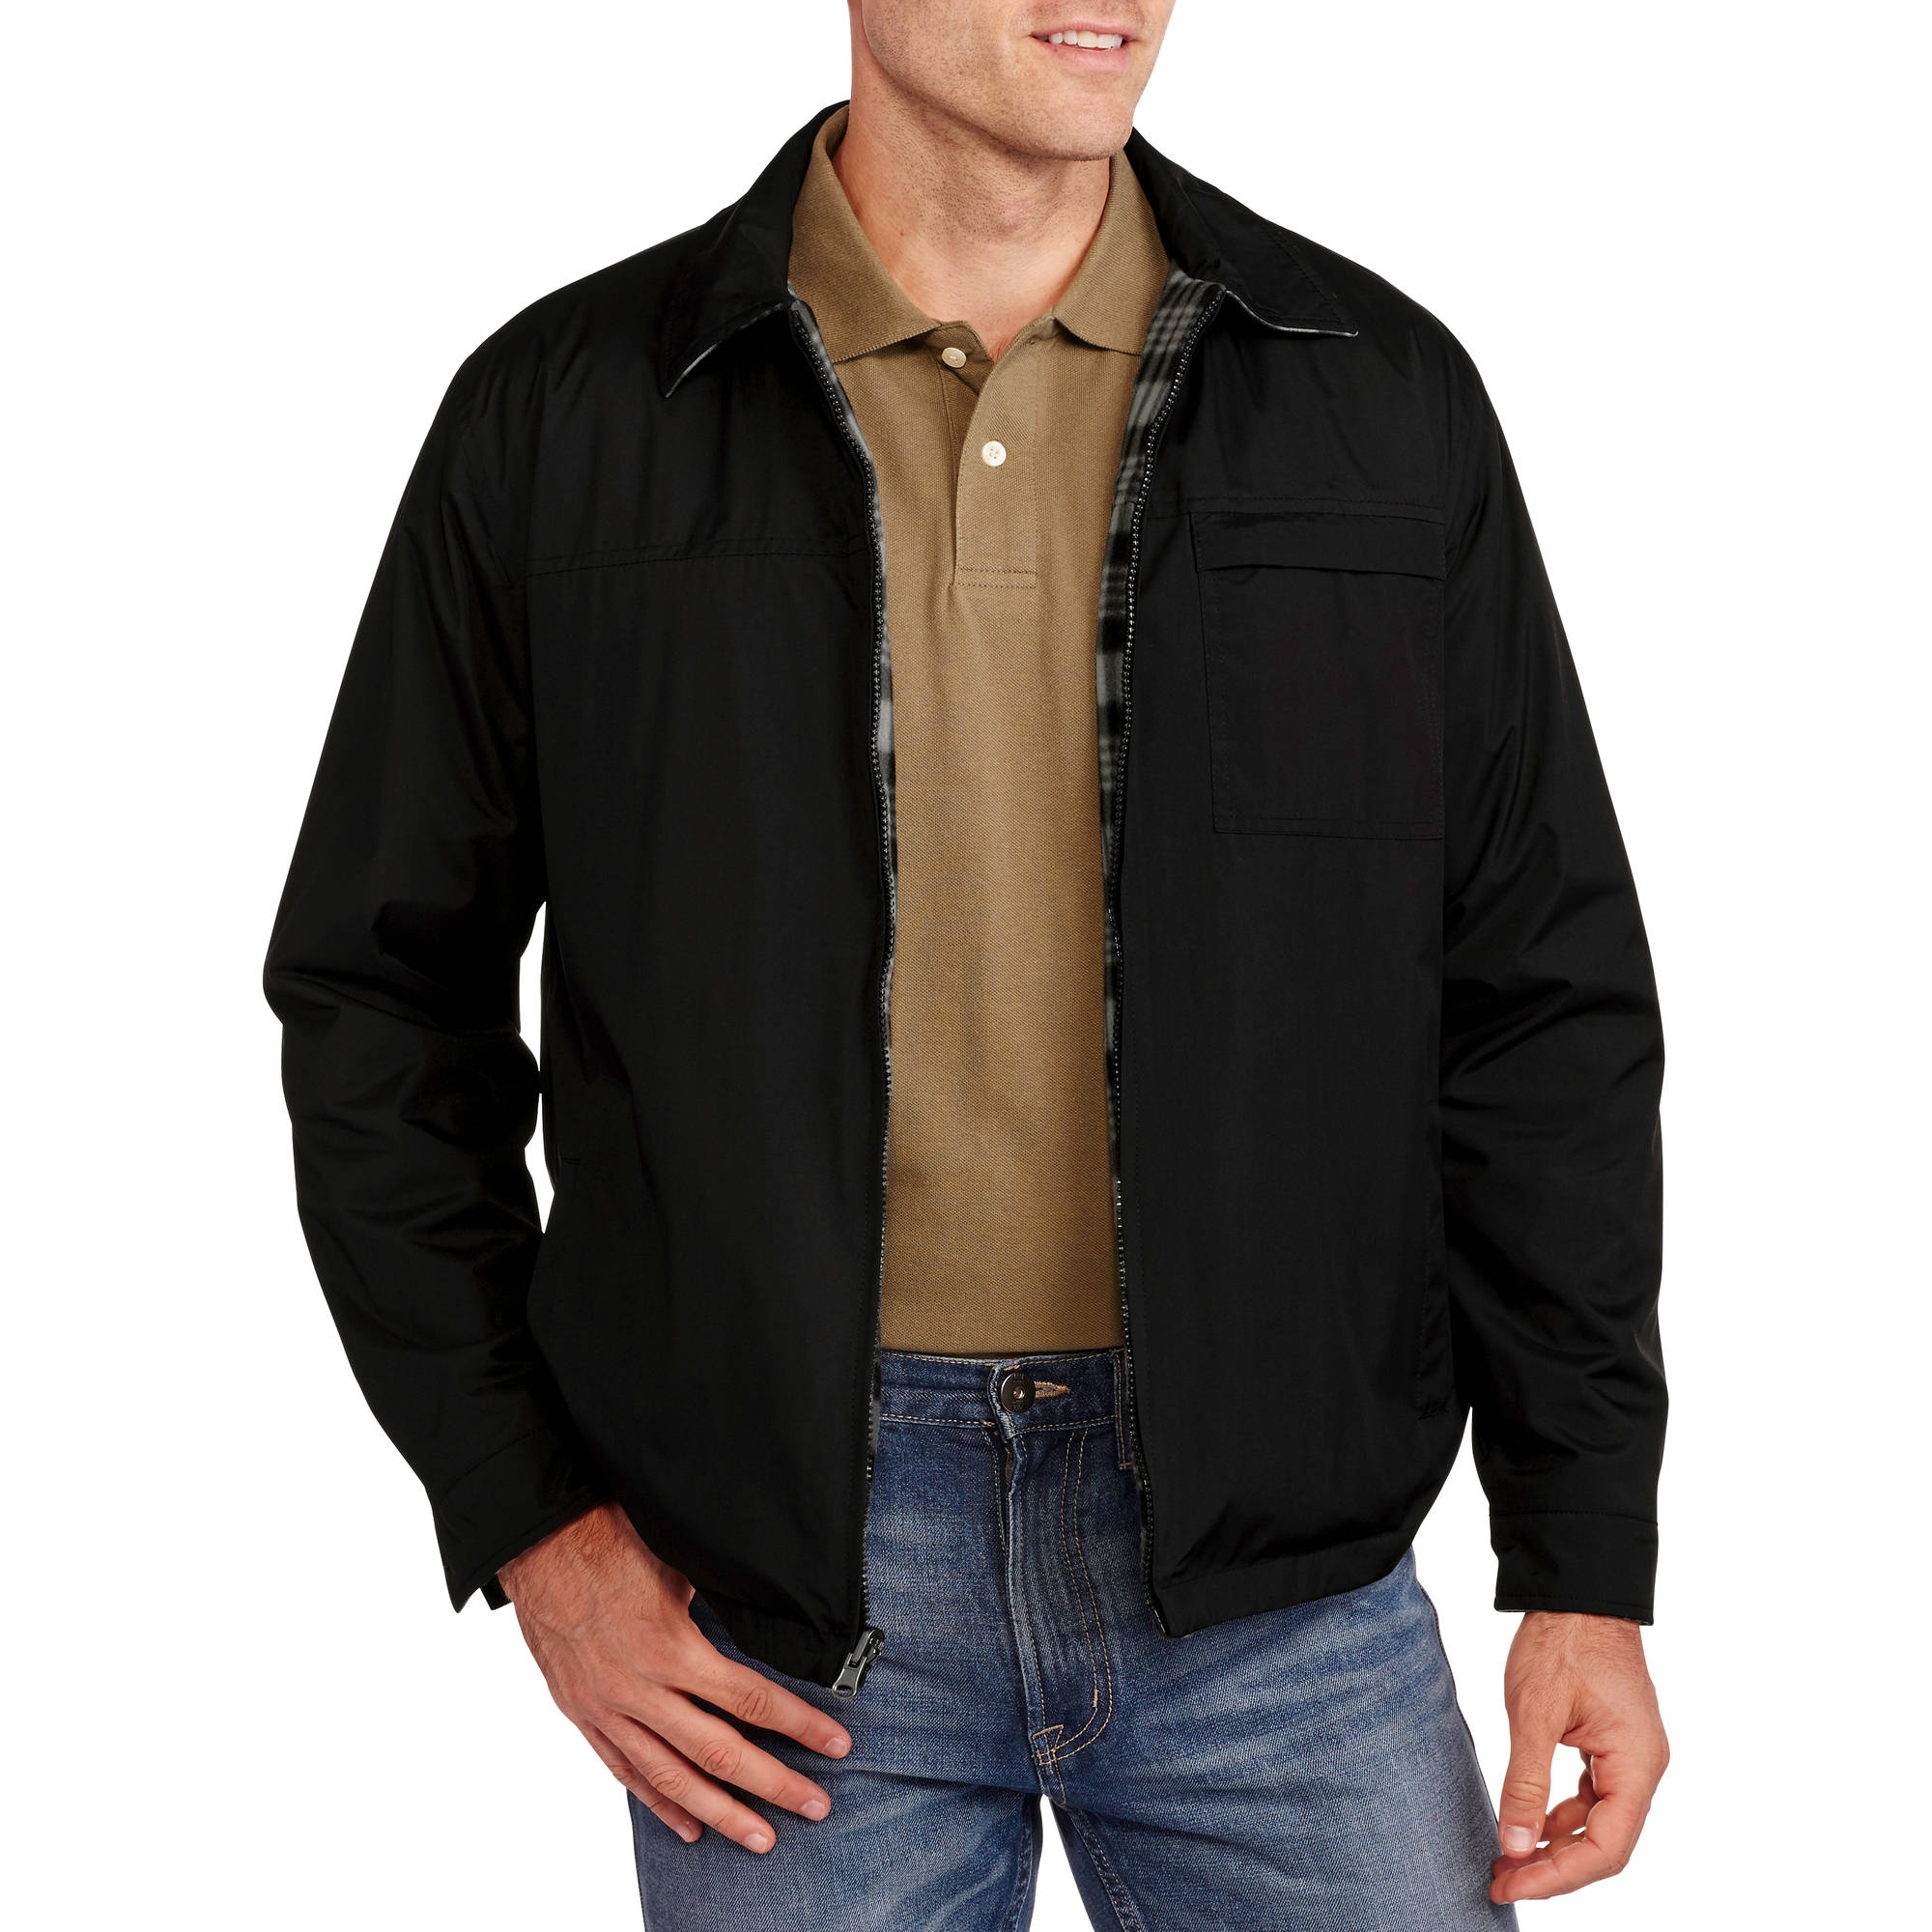 Big Men's Reversible Plaid Fleece Jacket, 2XL